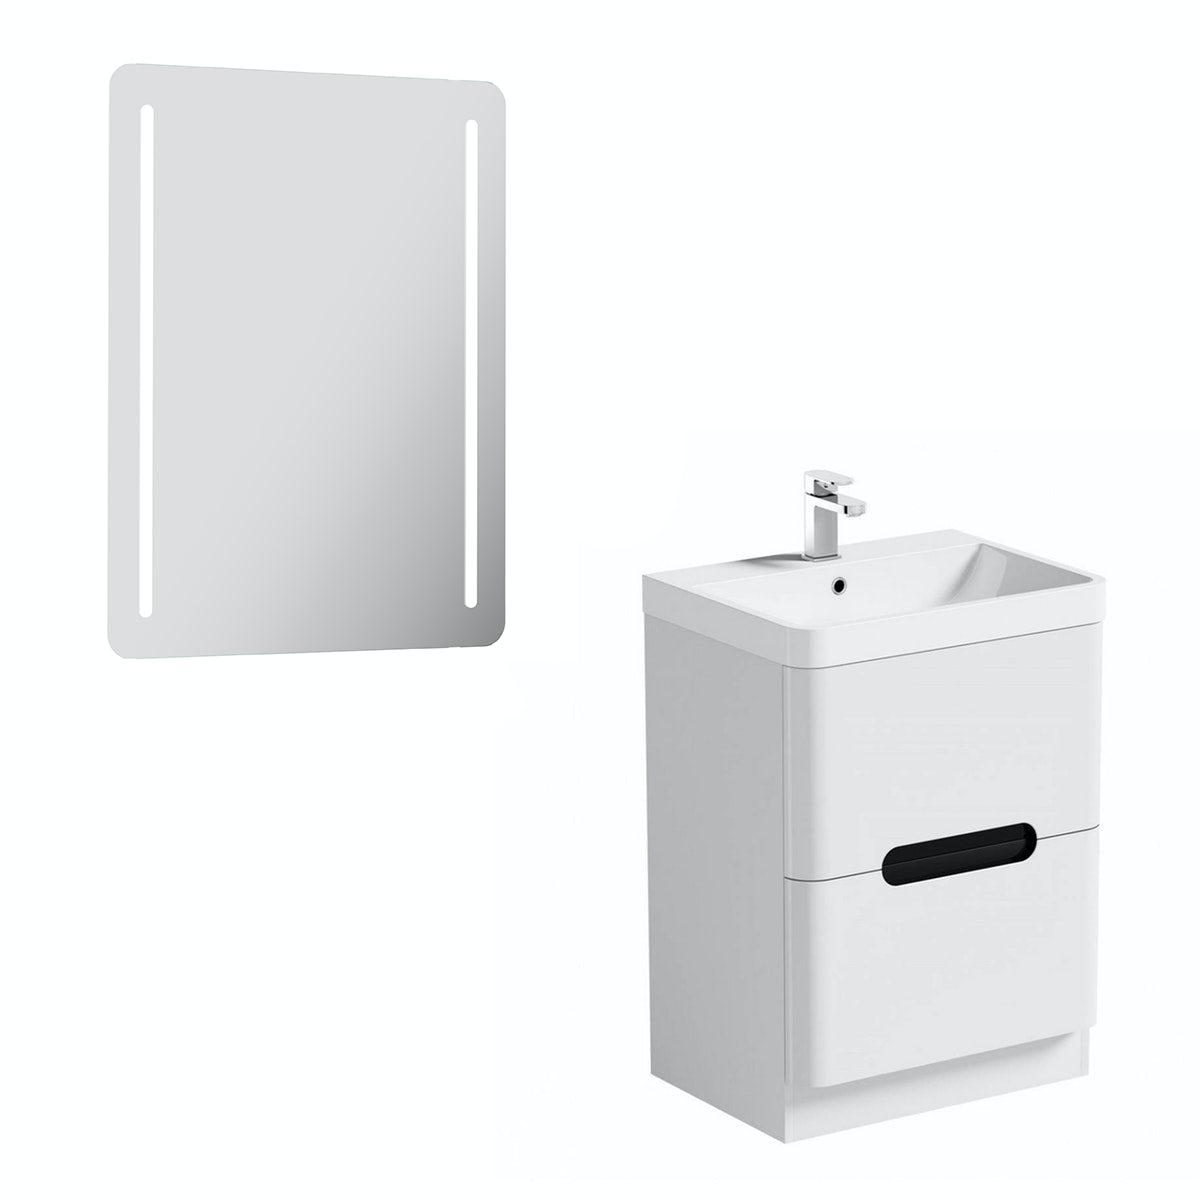 Mode Ellis essen vanity unit 600mm and mirror offer